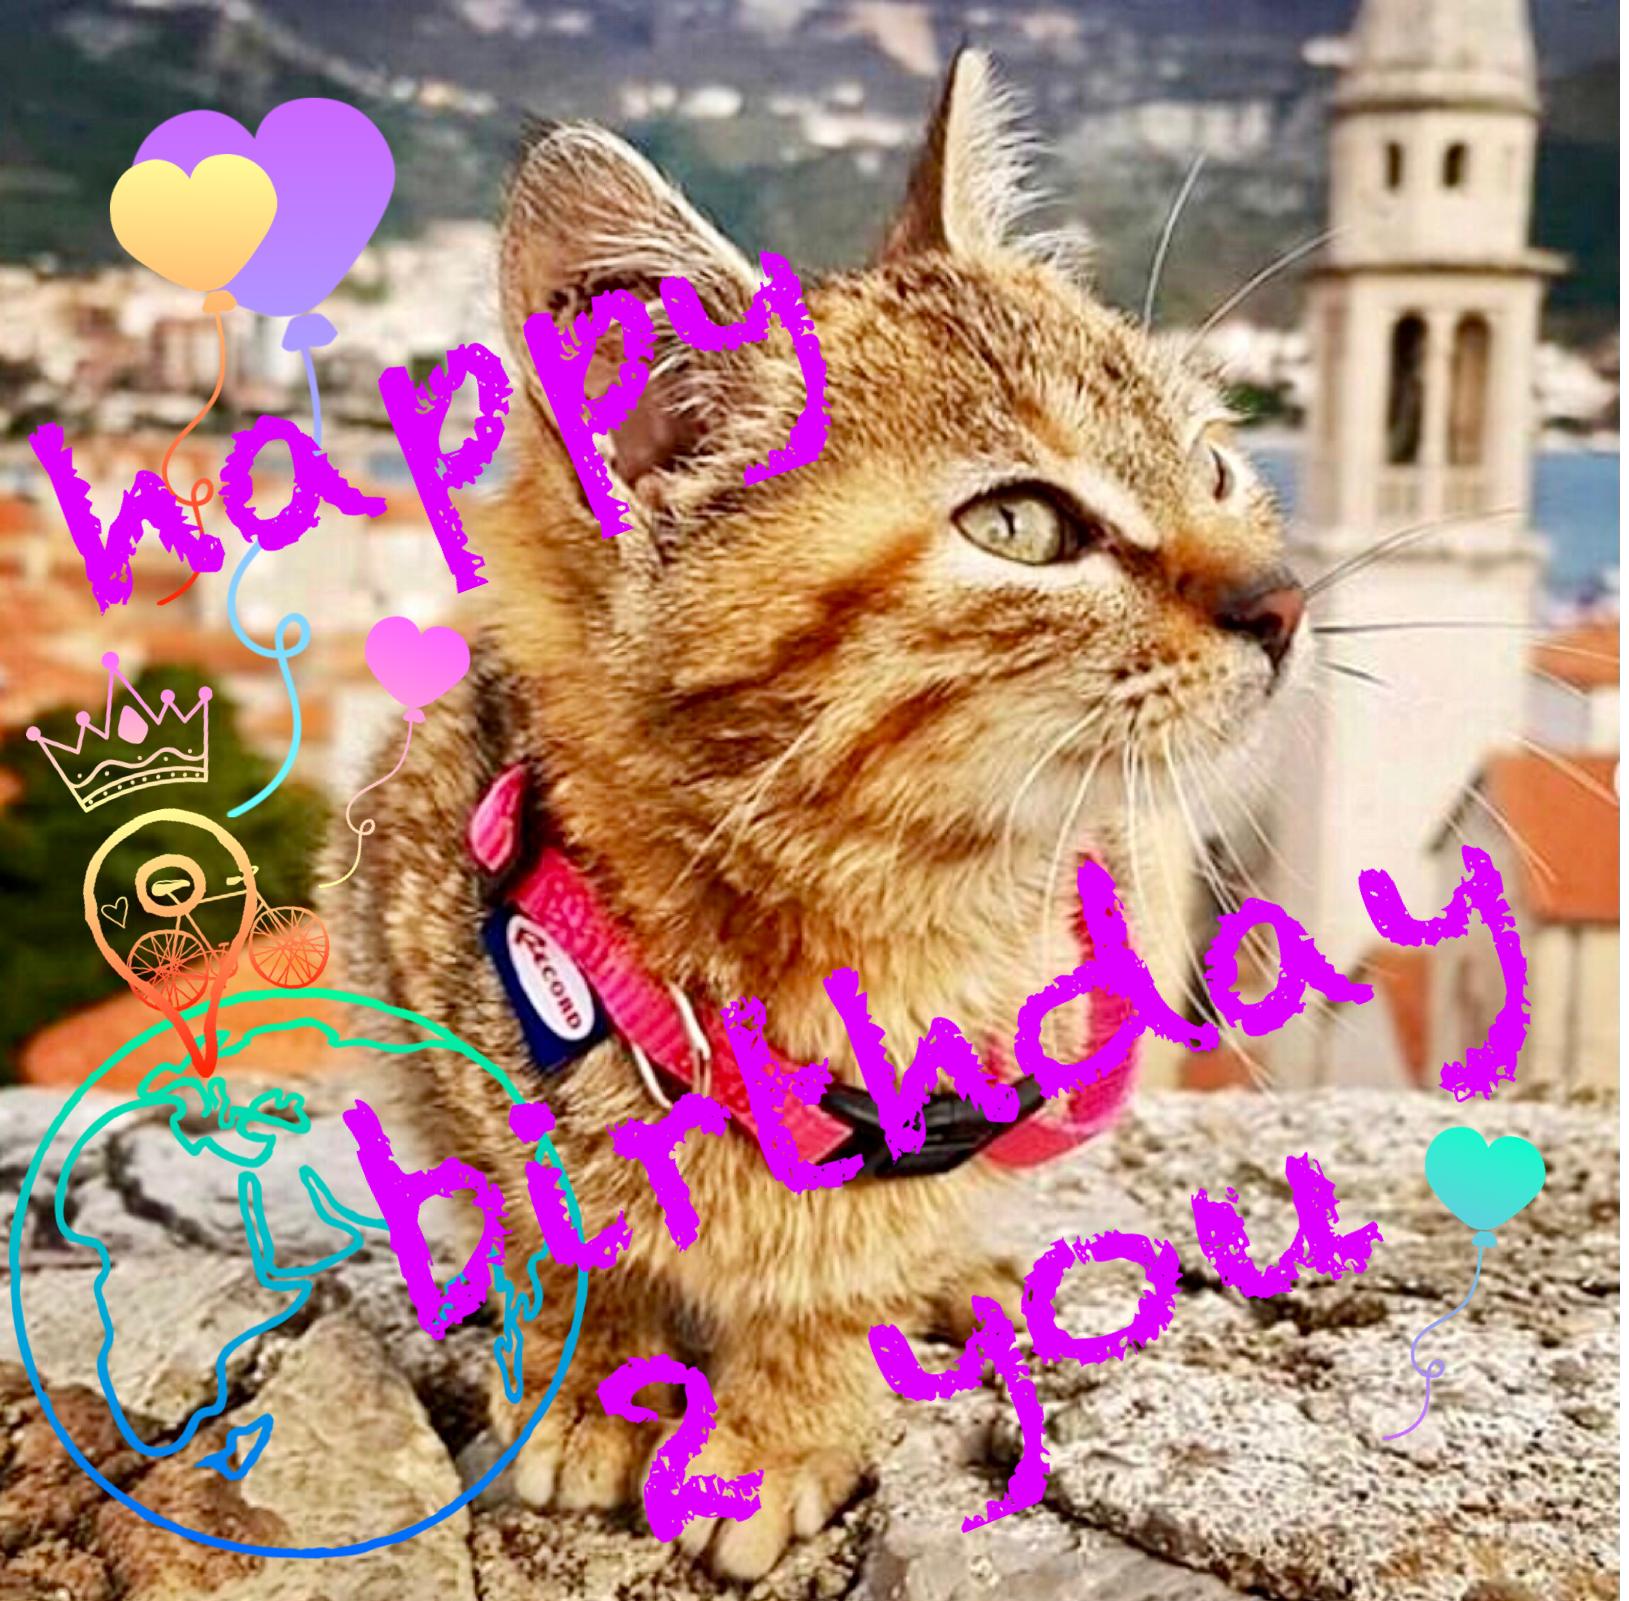 It's Nala's birthday today.